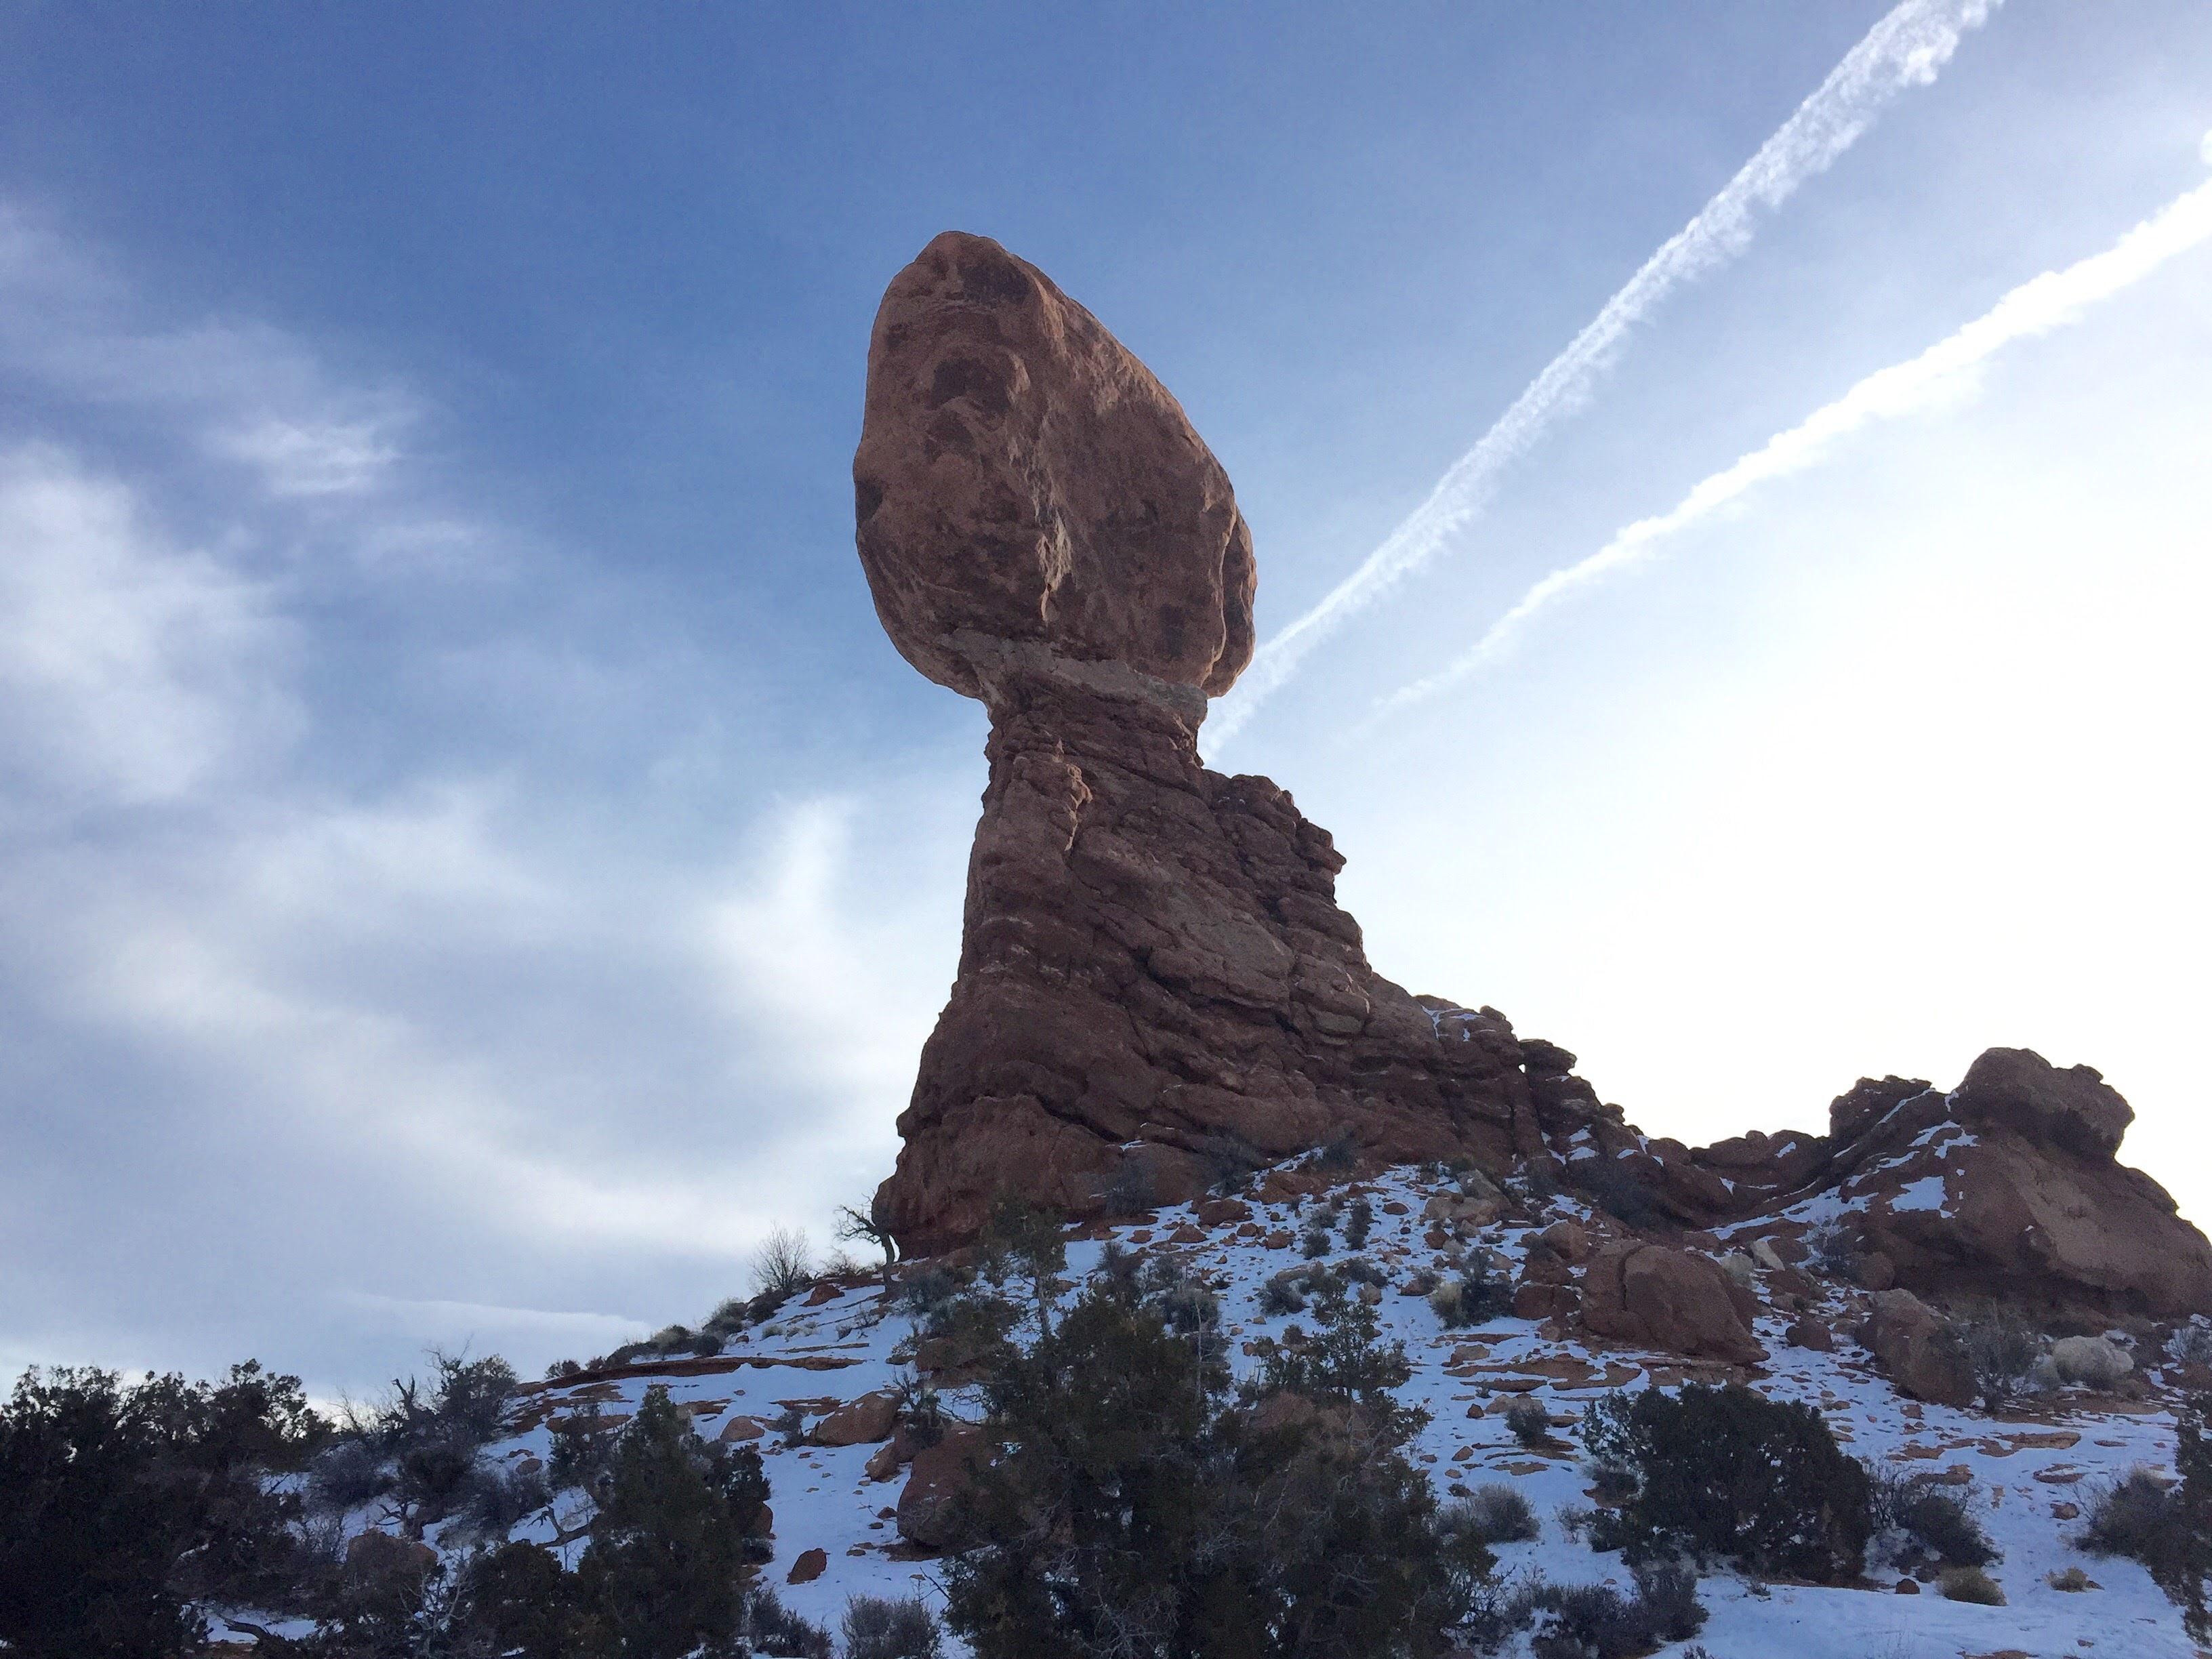 Balanced Rock Arches National Park, Moab, Utah